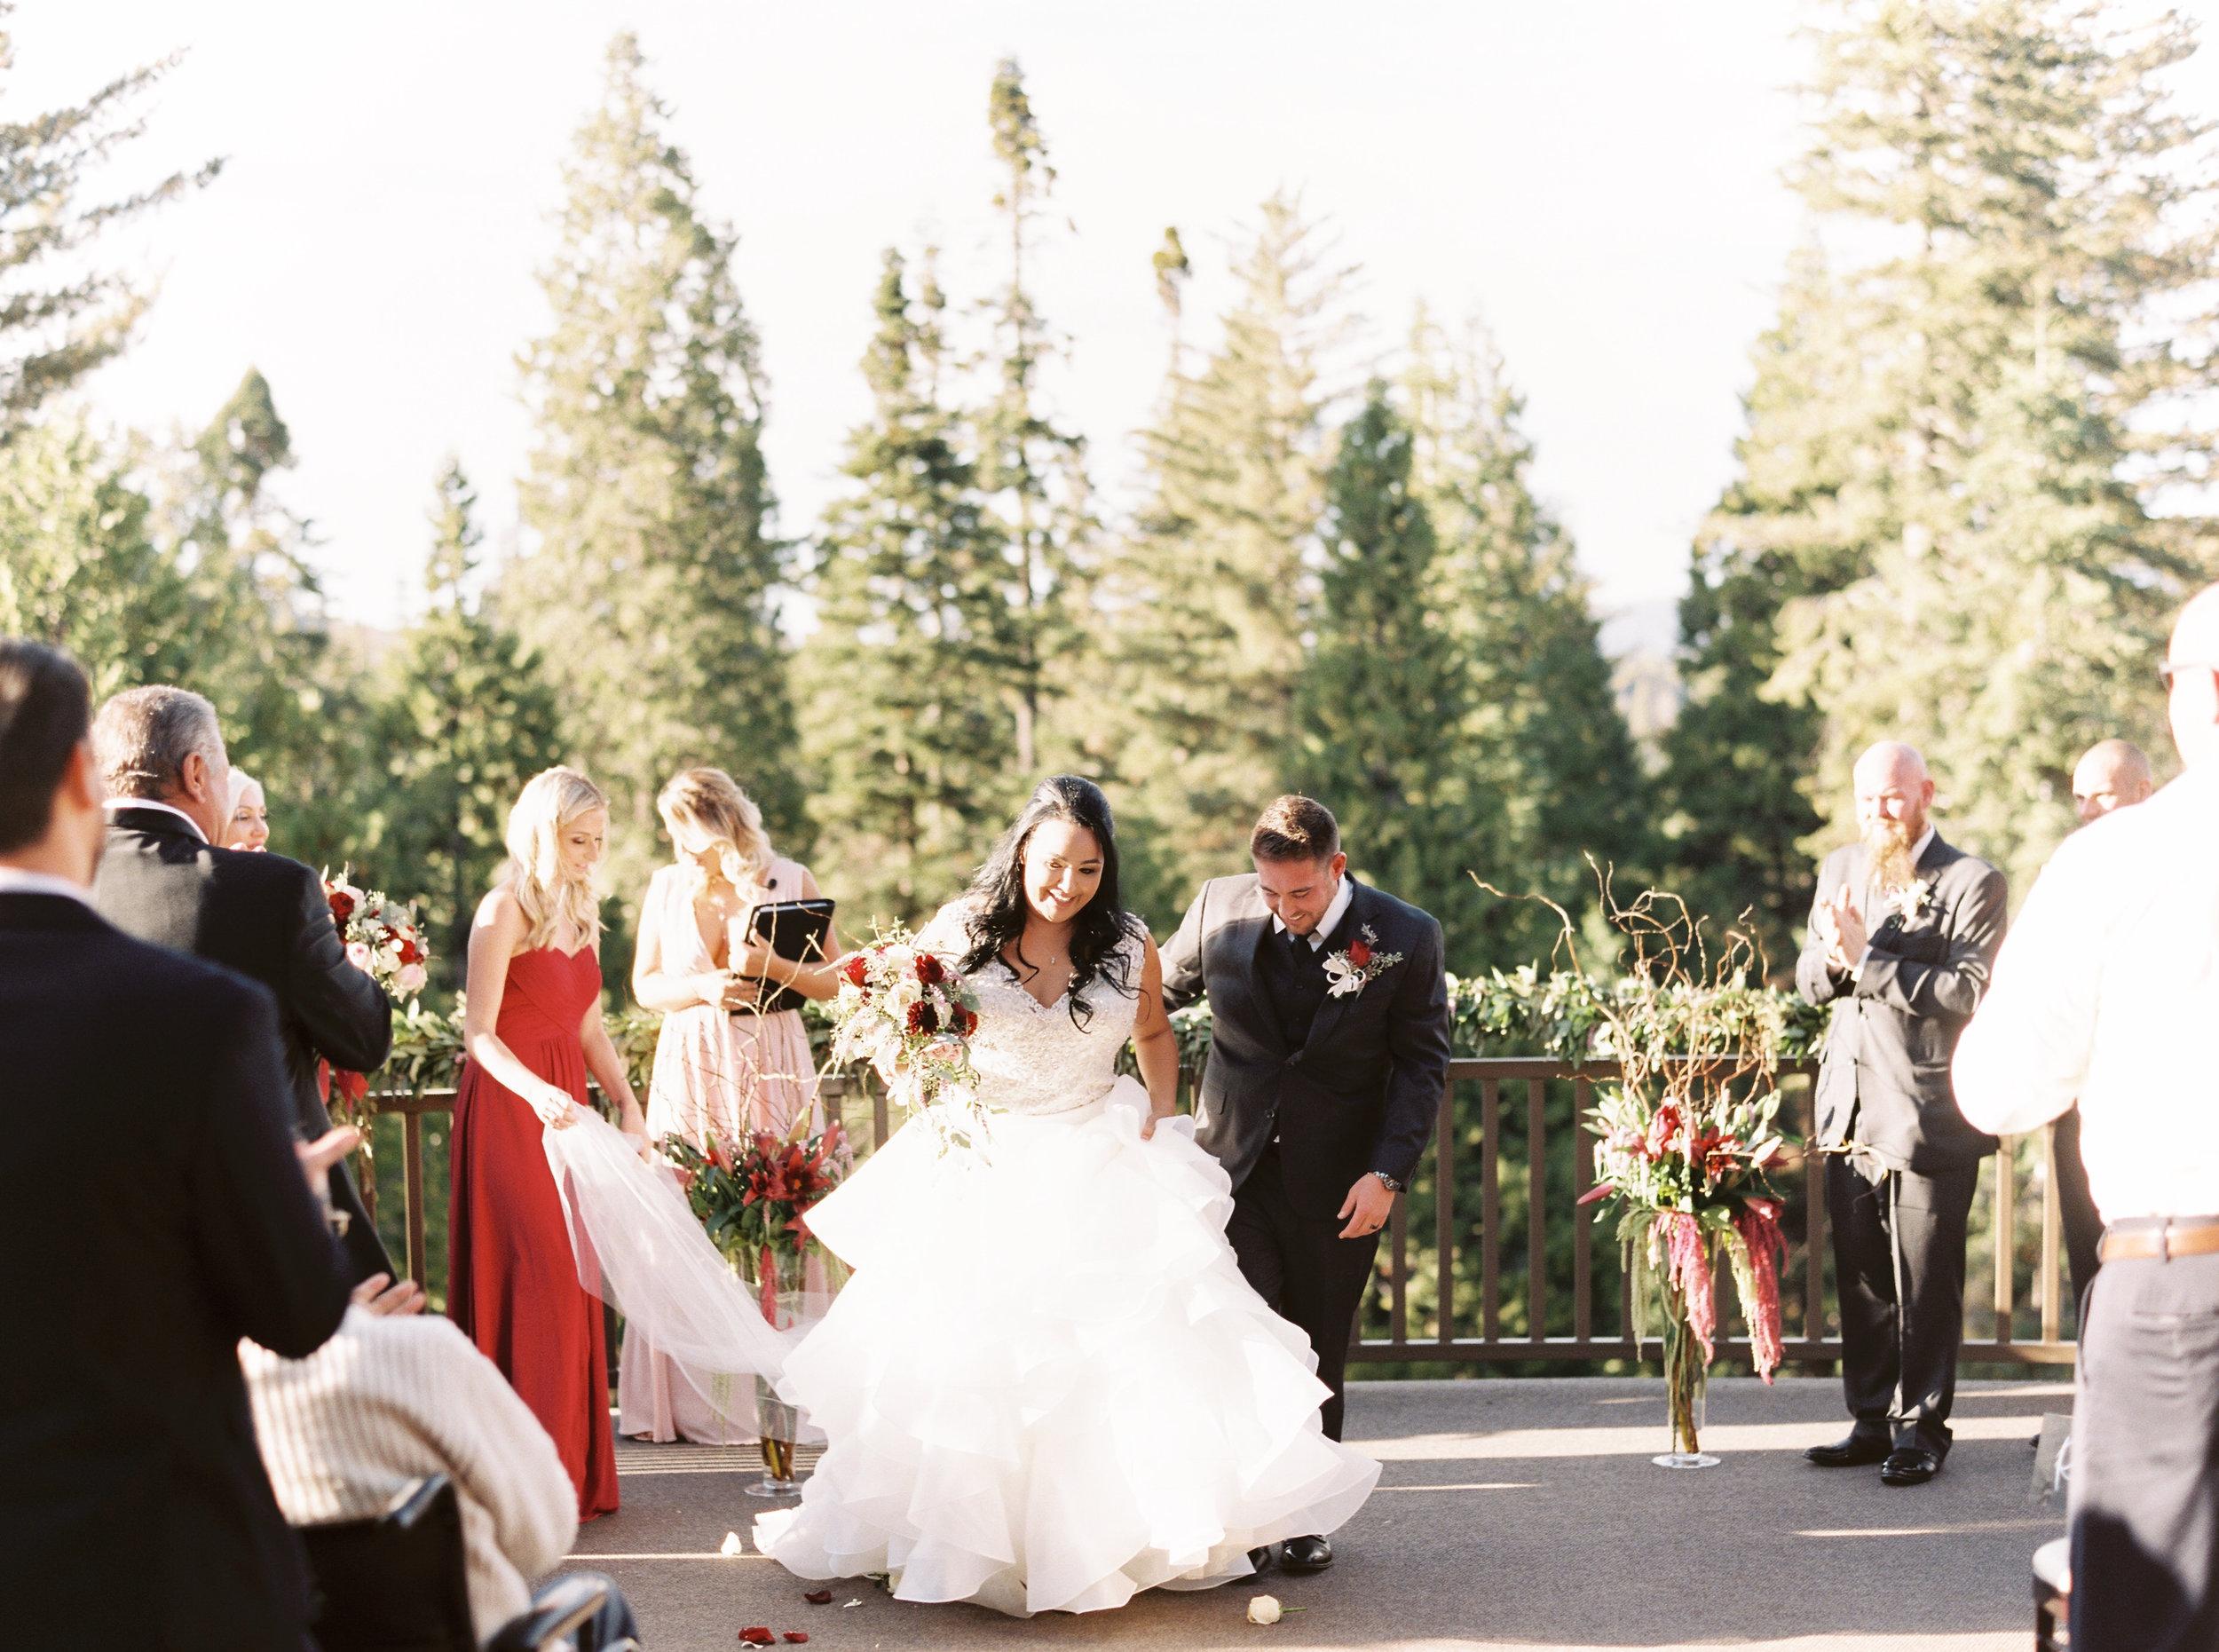 Tenaya-lodge-wedding-at-yosemite-national-park-california-83.jpg